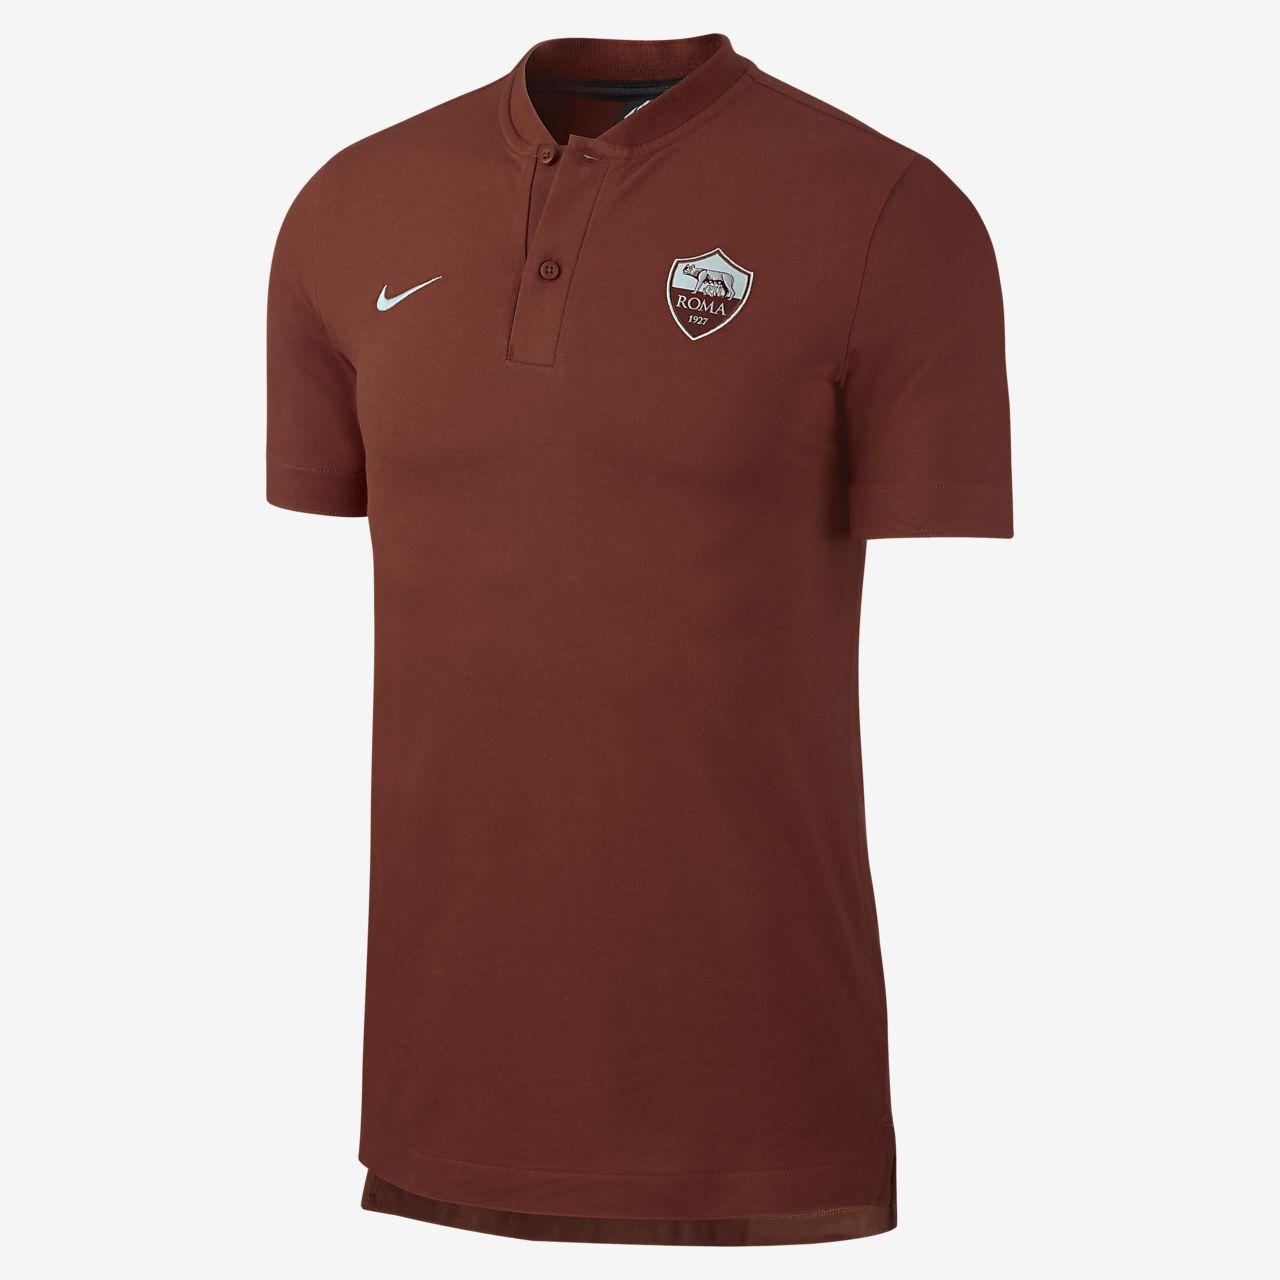 Мужская рубашка-поло A.S. Roma Grand Slam